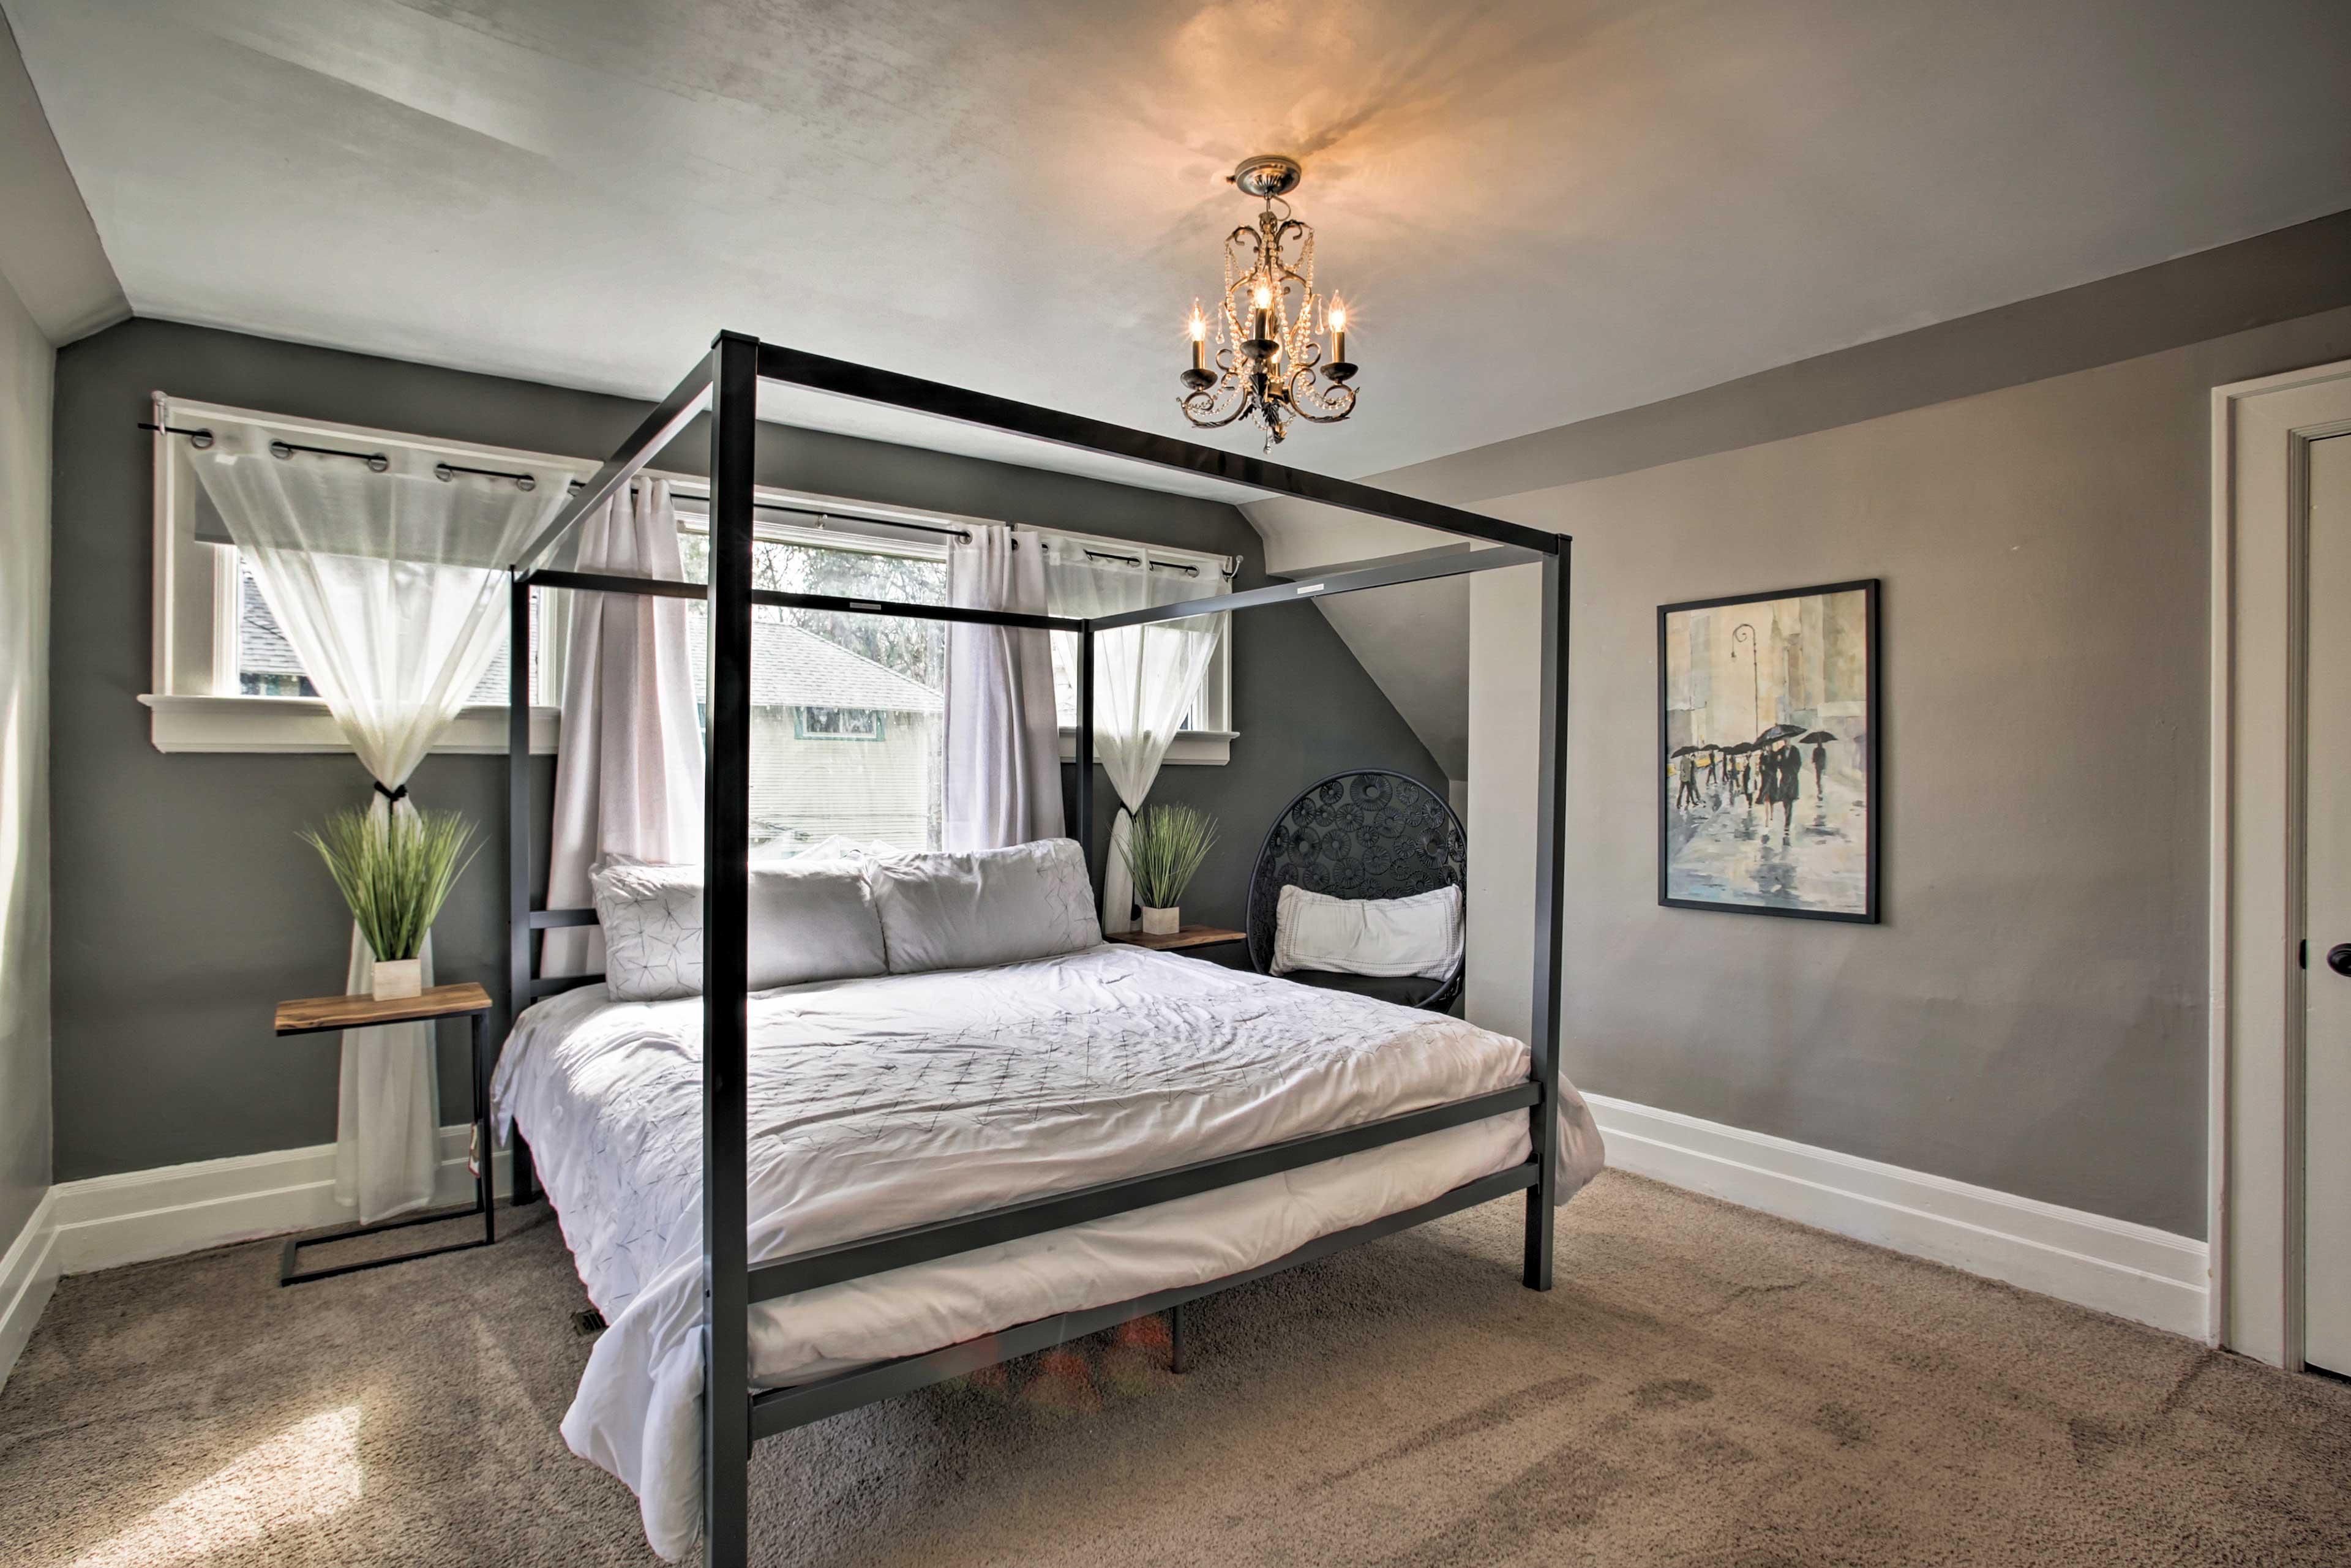 Each room features clean, elegant decor.